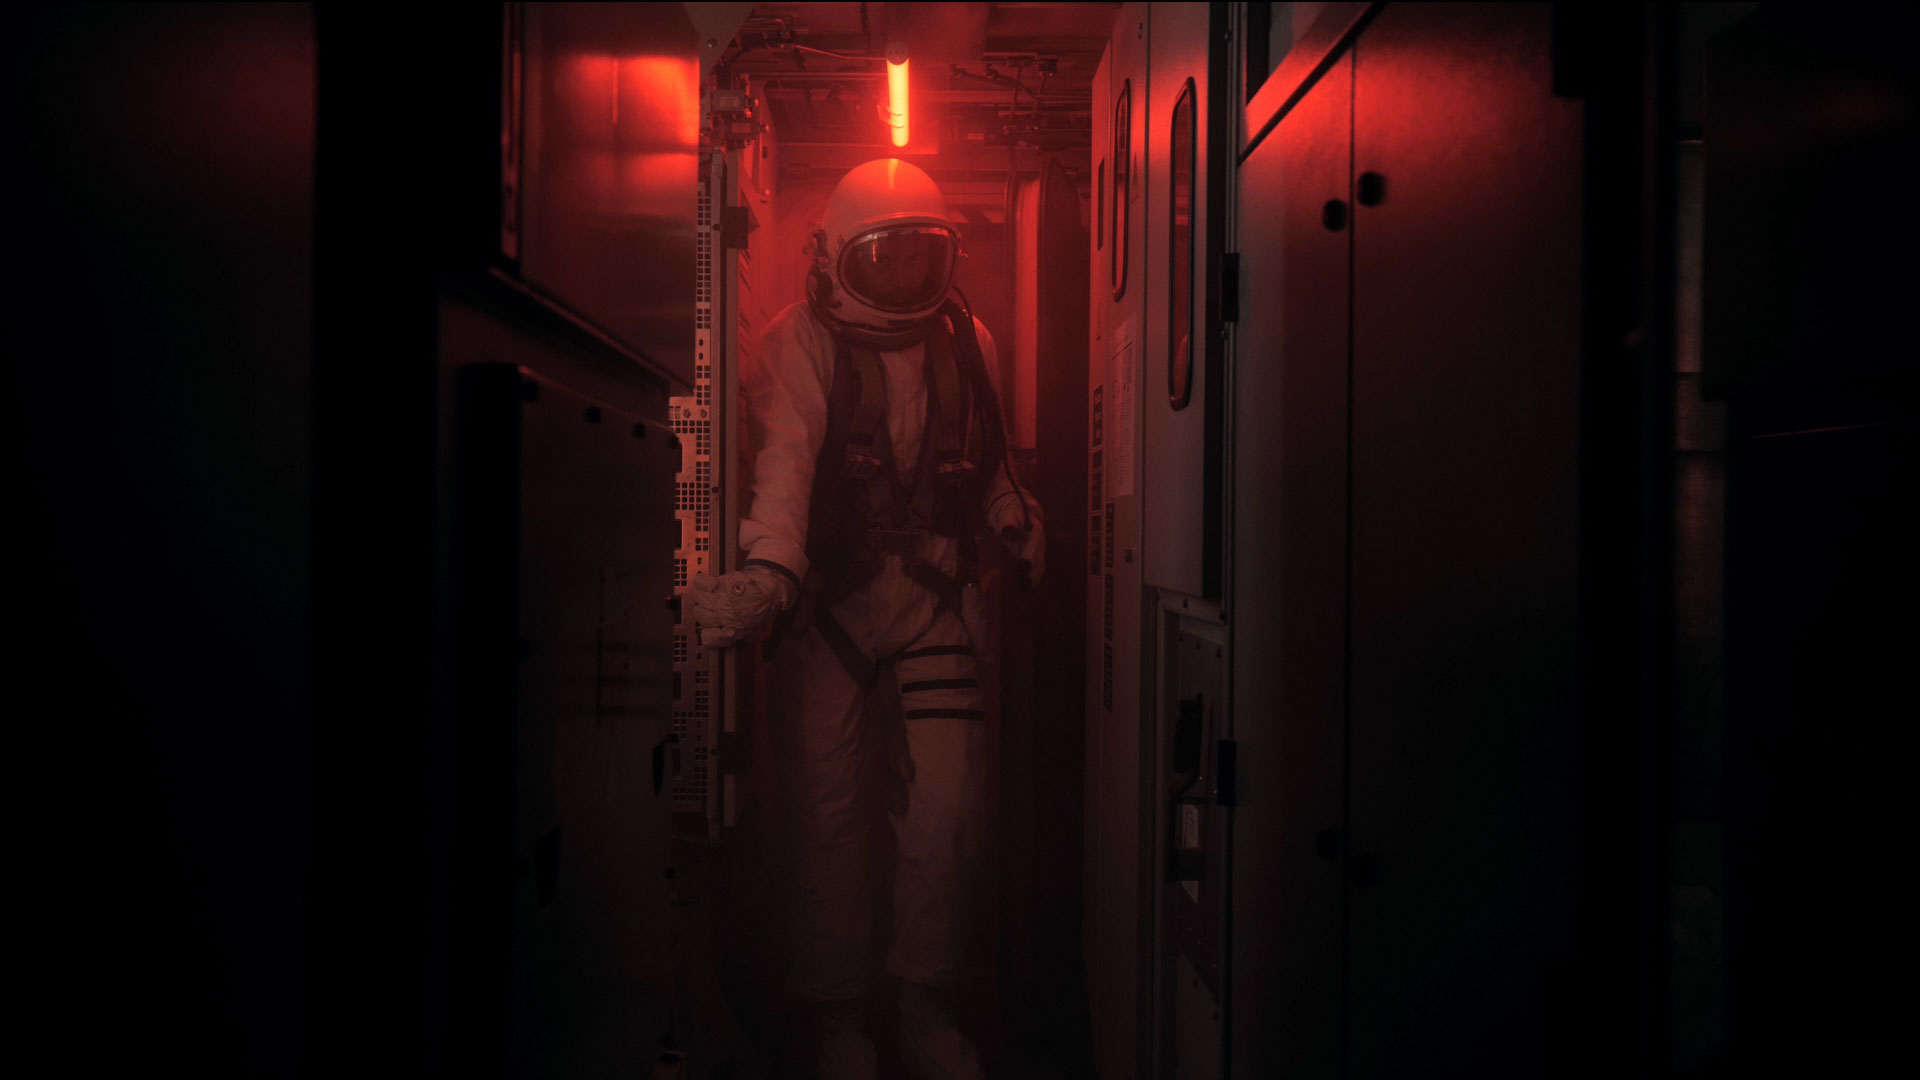 Akademie Astronaut